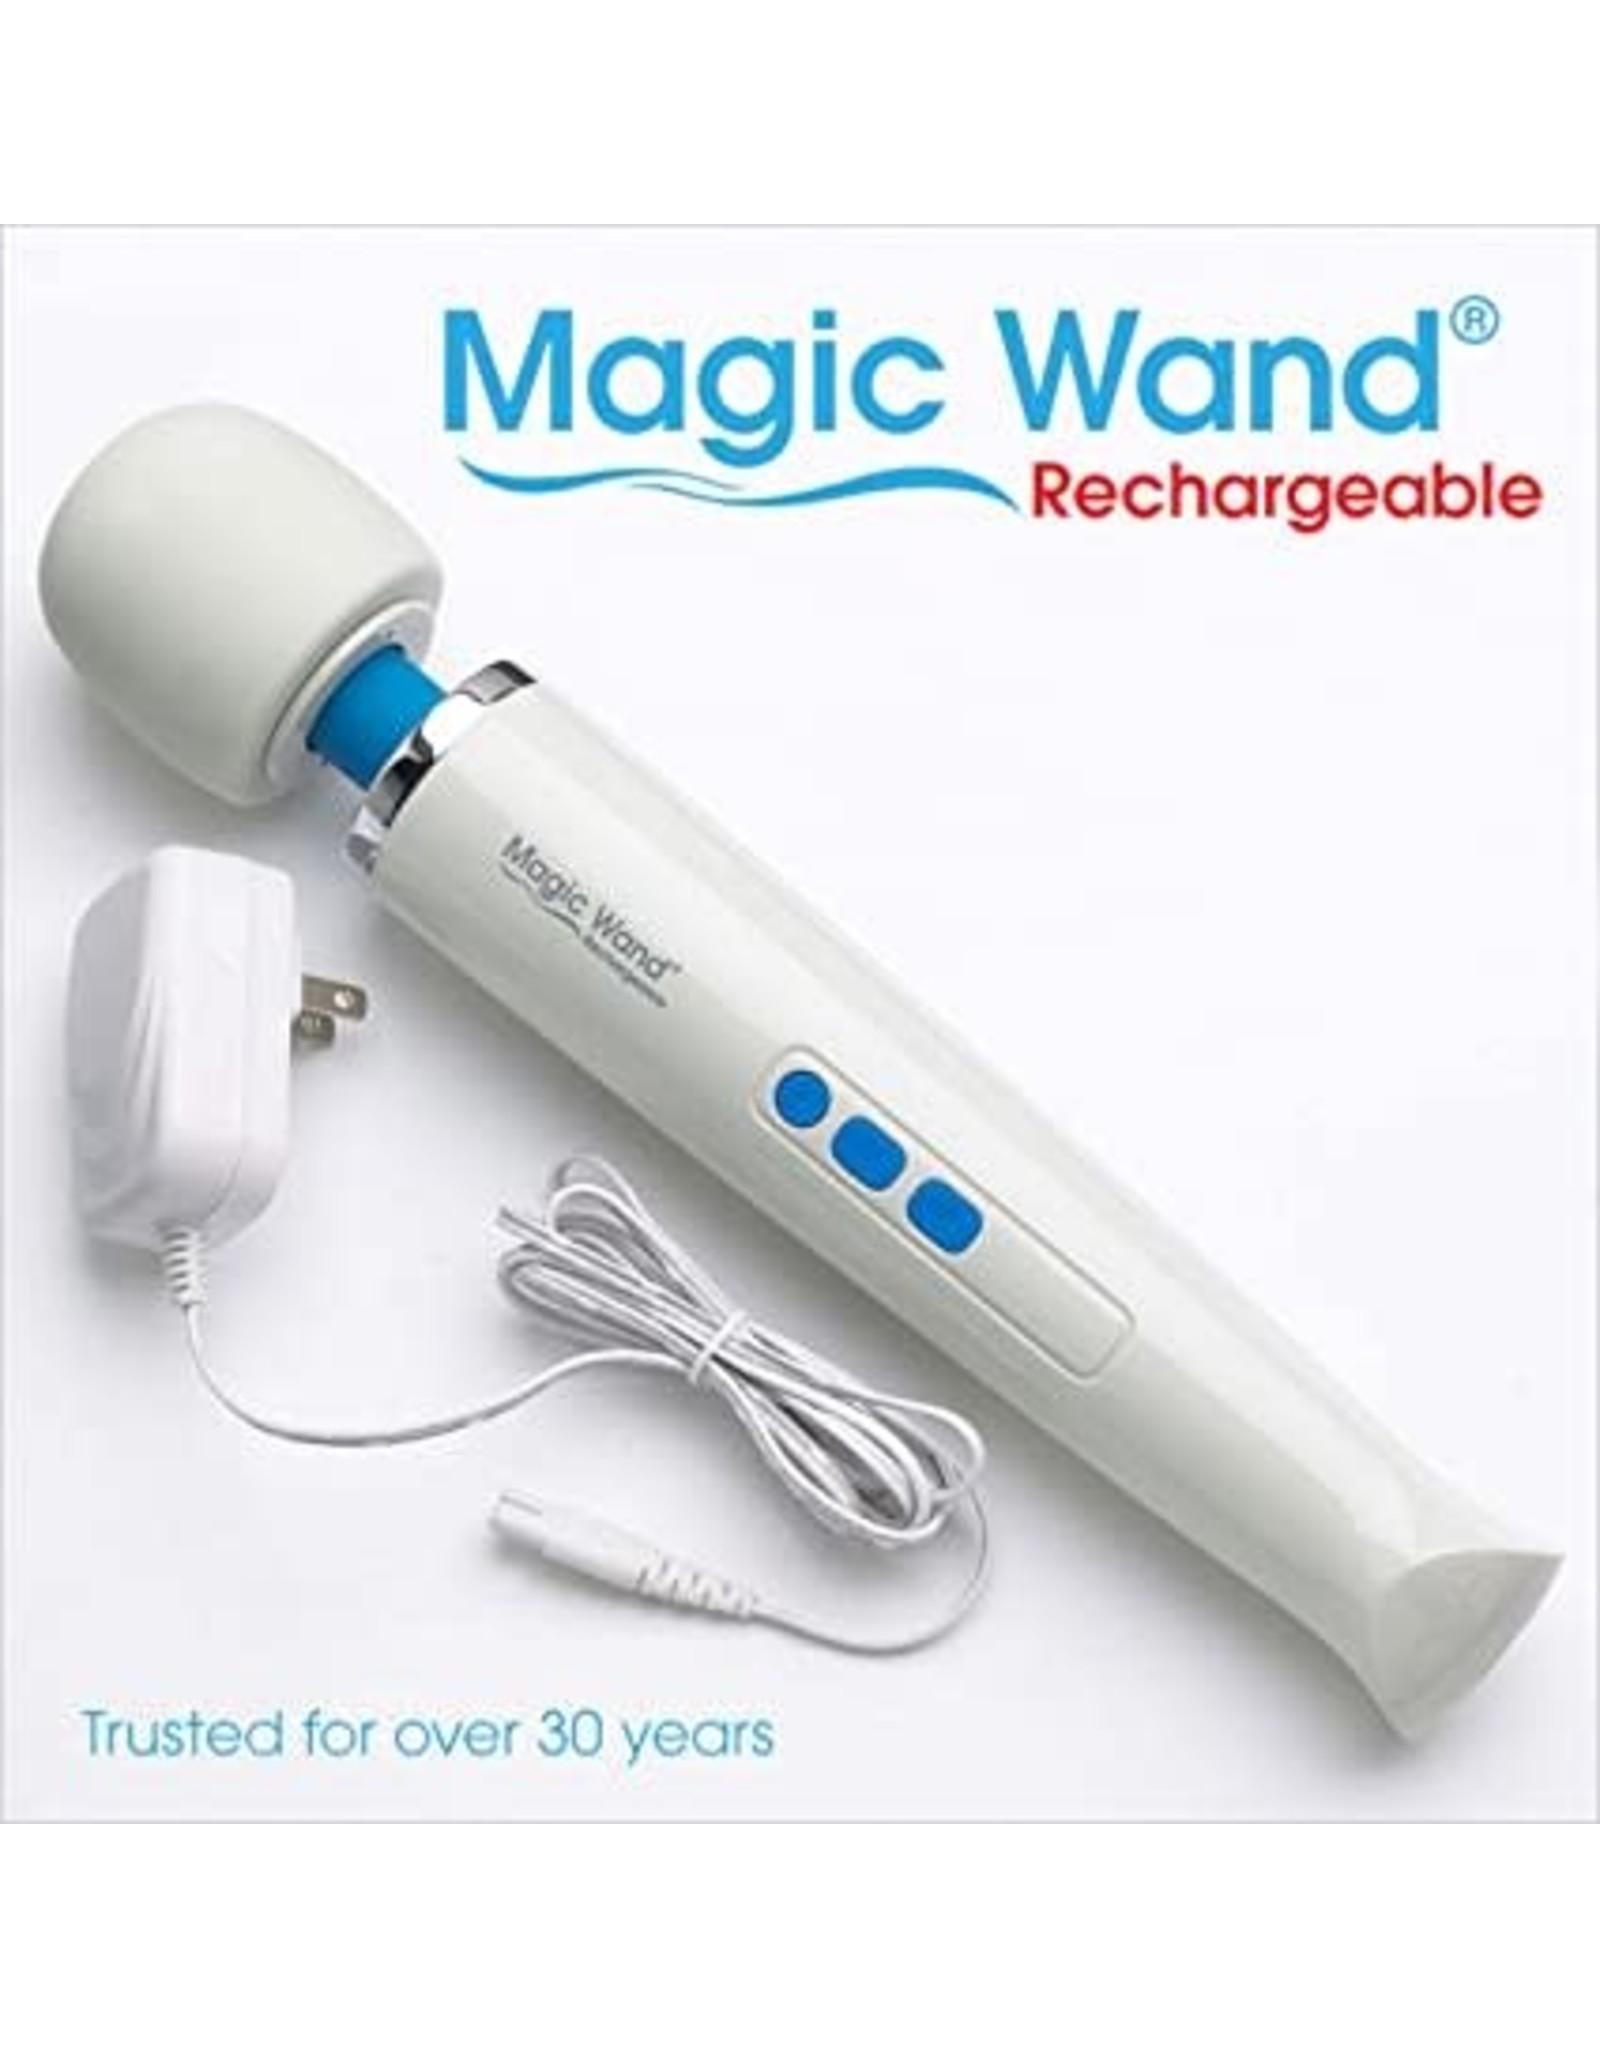 Magic Wand Magic Wand Original Personal Massager Rechargeable